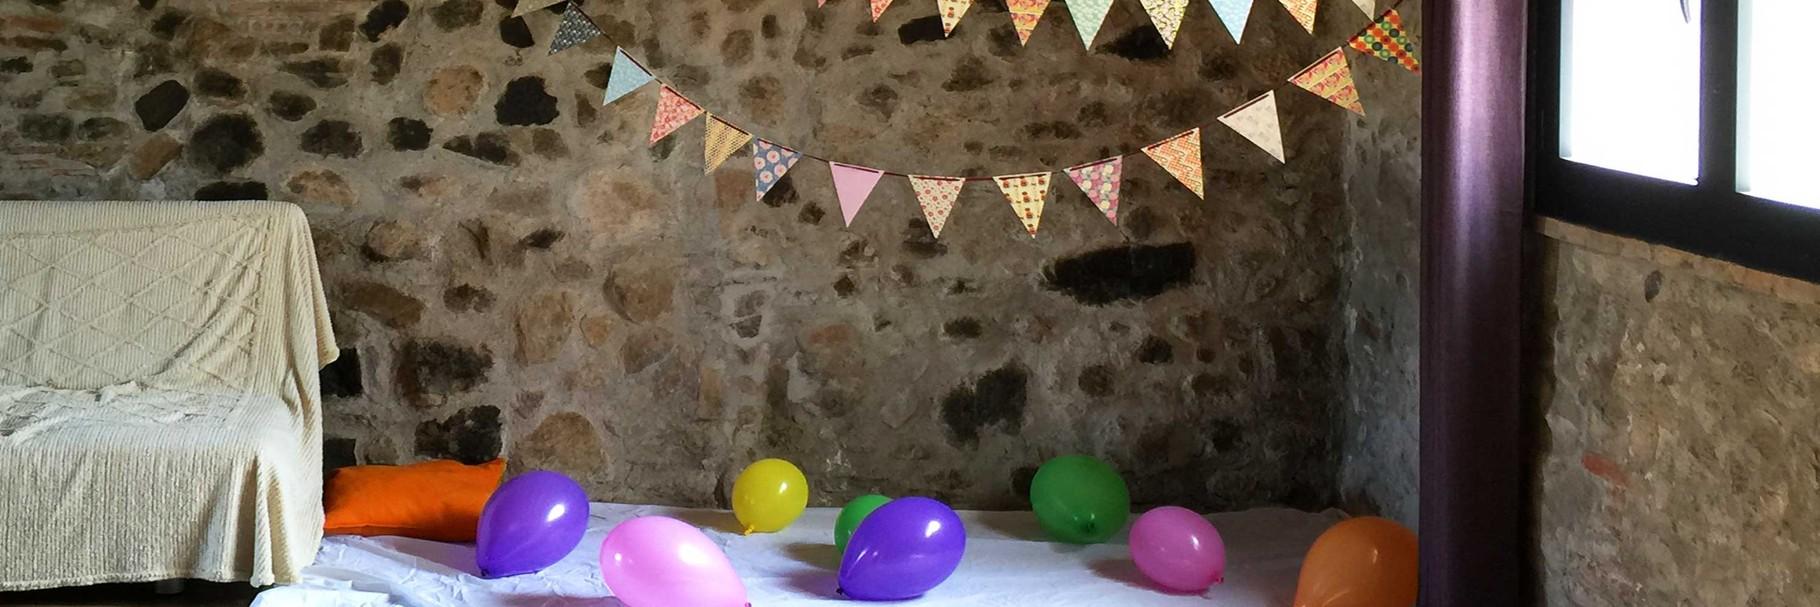 Sala y globos